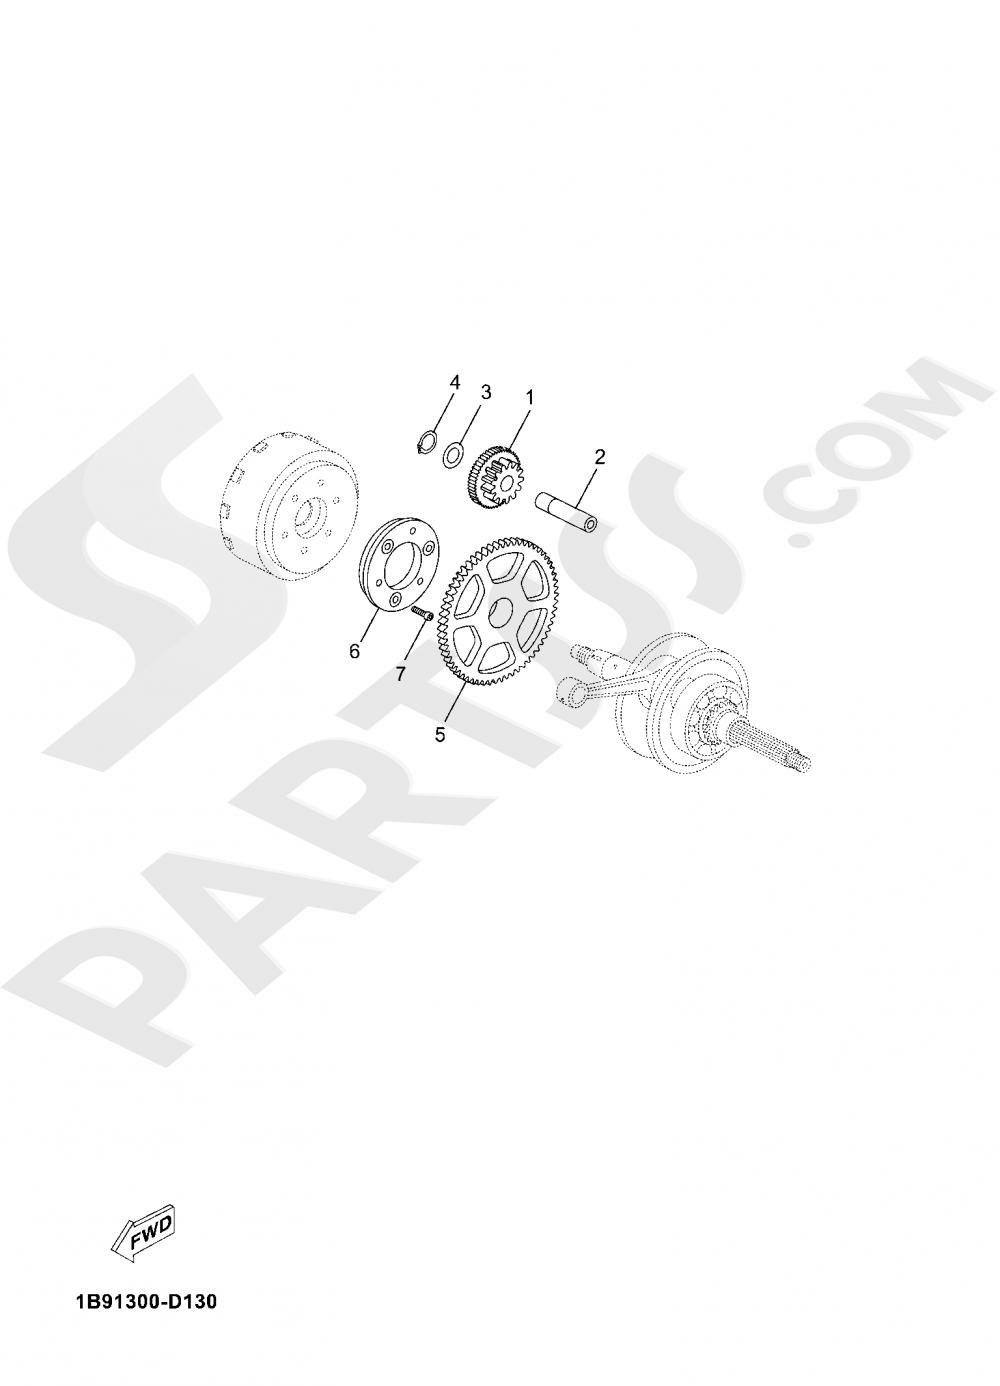 STARTER Yamaha X-Max 125 ABS 2020